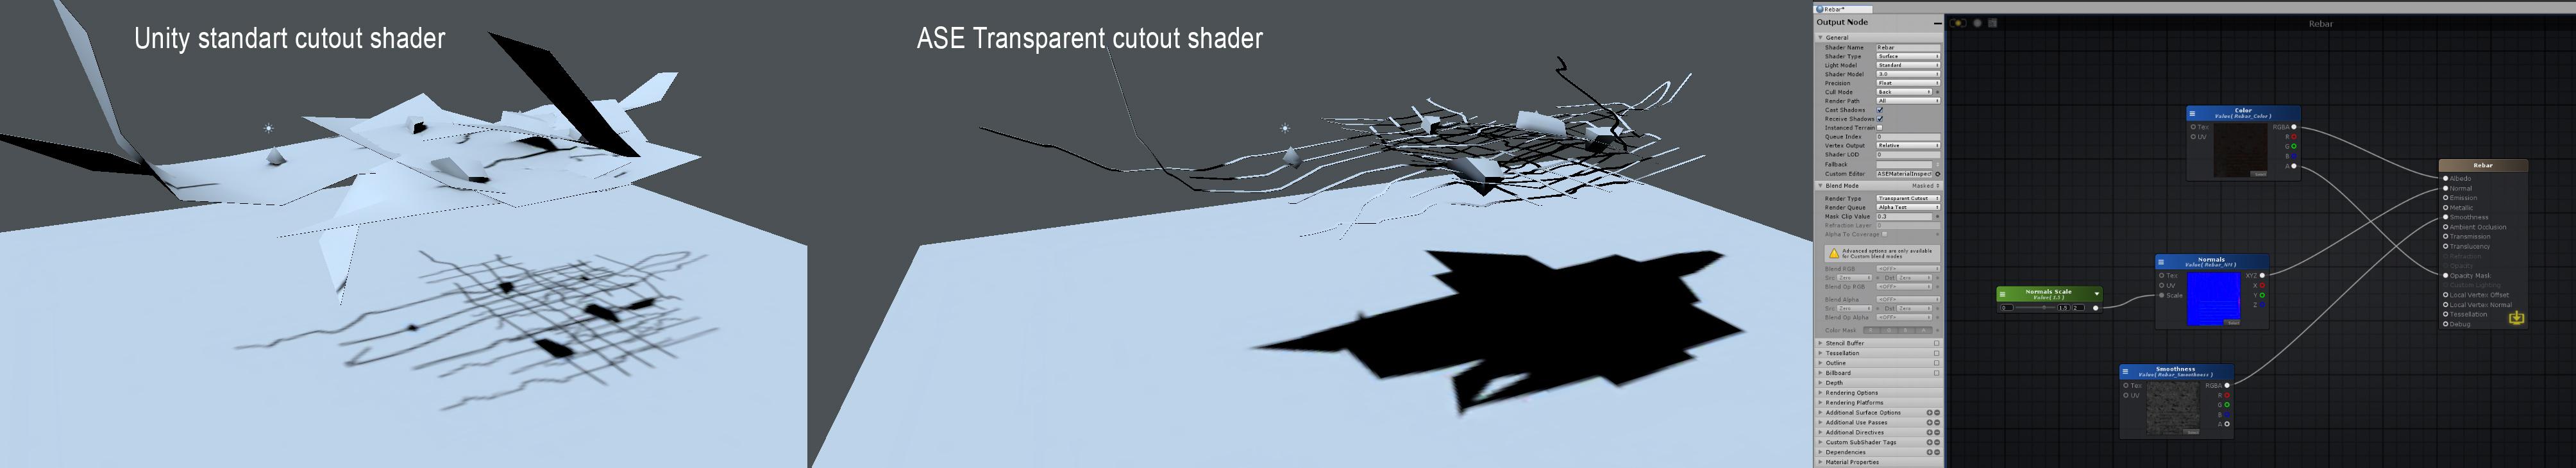 Shadow_Bake.jpg